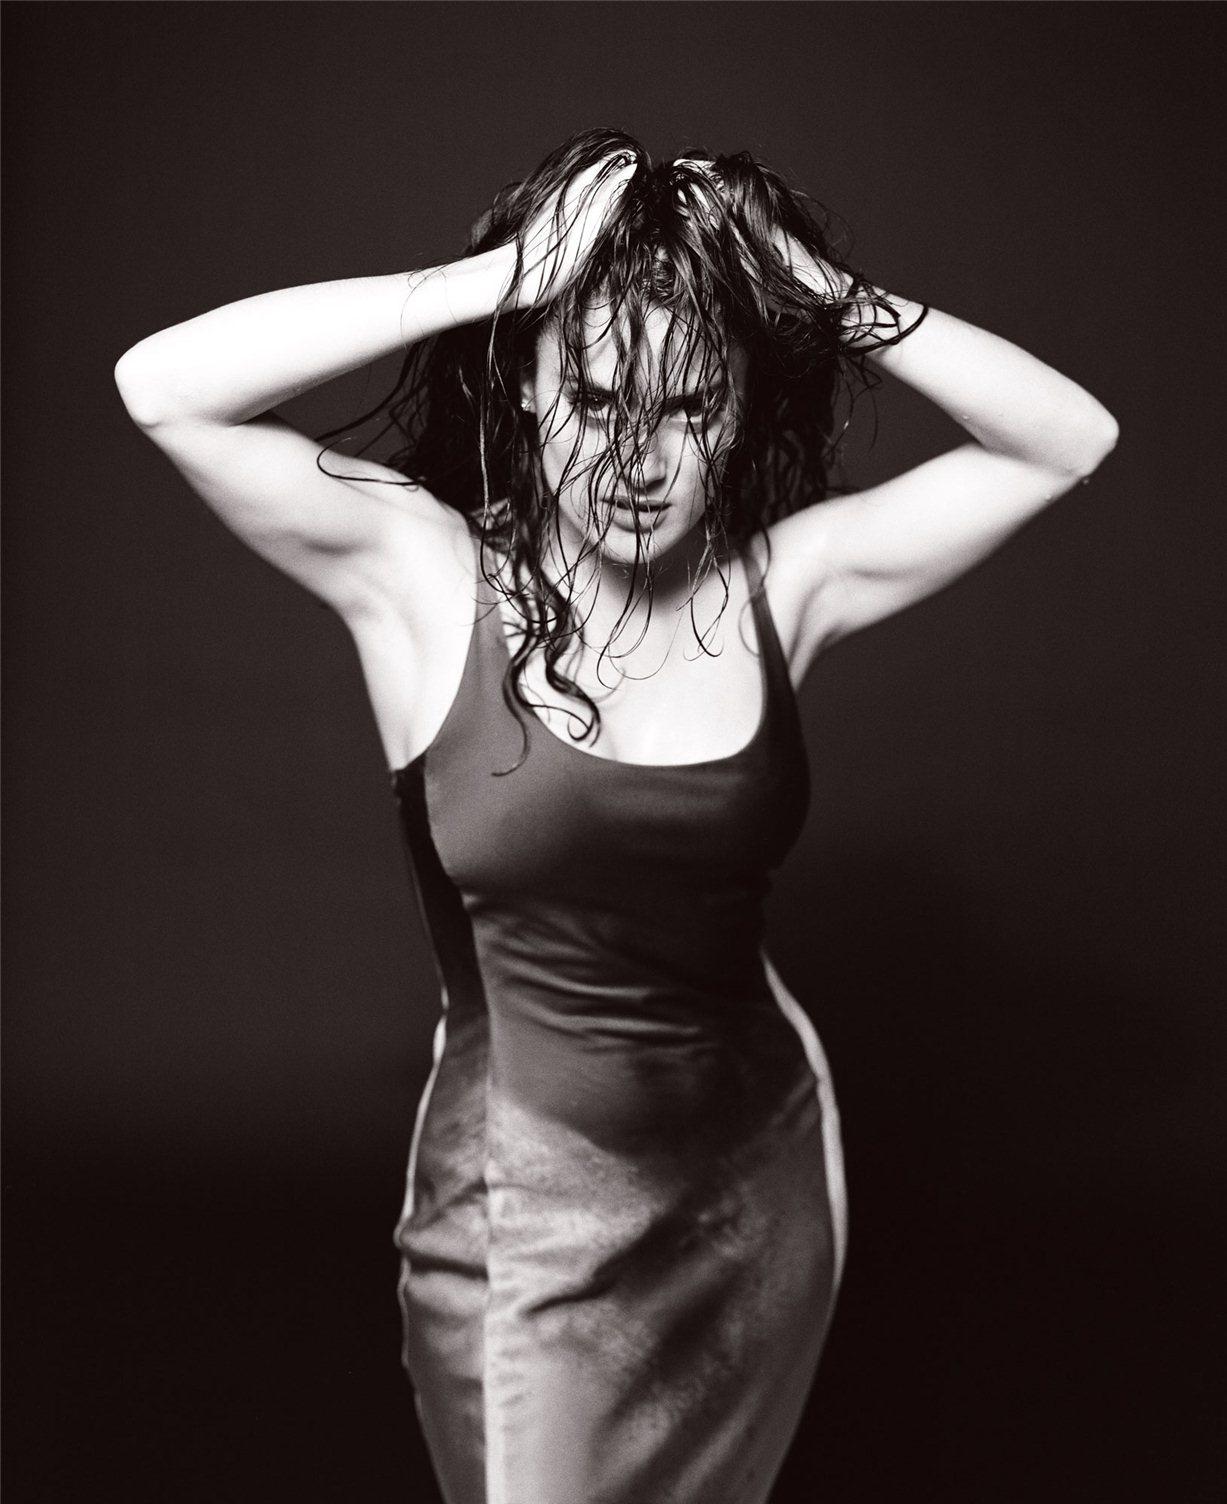 Salma Hayek / Сальма Хайек - звезды Голливуда, фотограф Firooz Zahedi